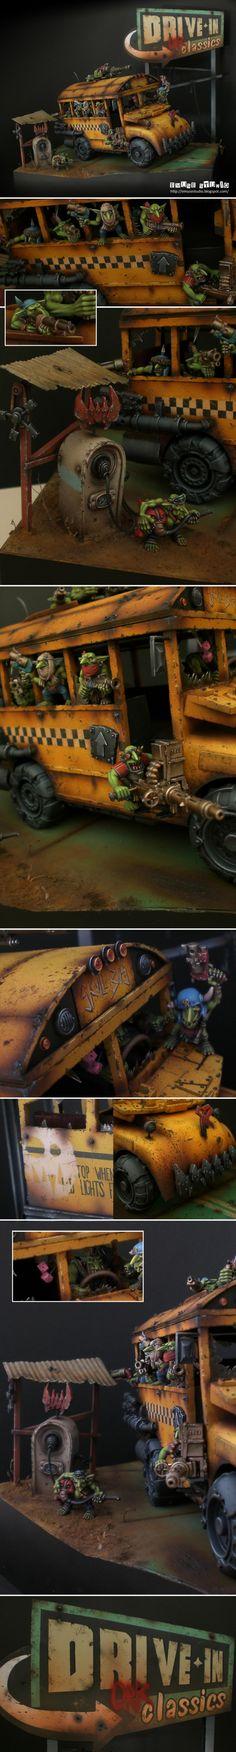 Skull Bus, Ork Battlewagon or Trukk, conversion, diorama, Warhammer 40k.